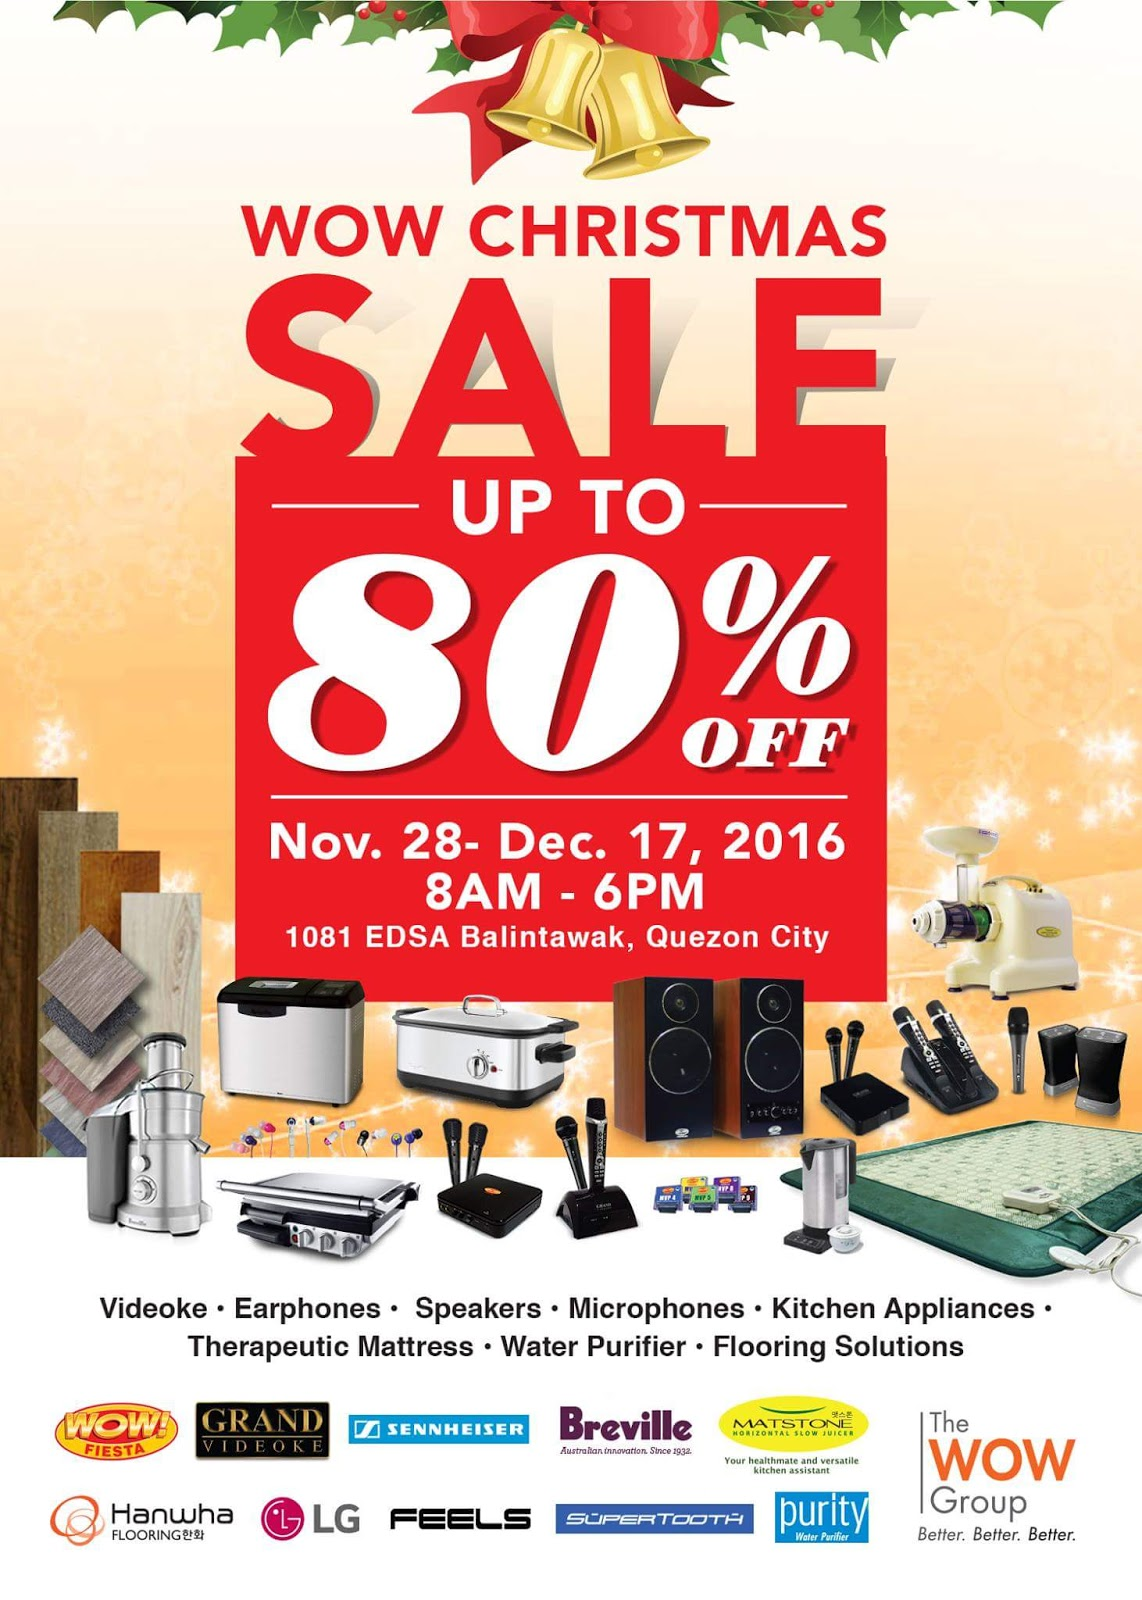 Wow Christmas.Manila Shopper The Wow Group Christmas Warehouse Sale